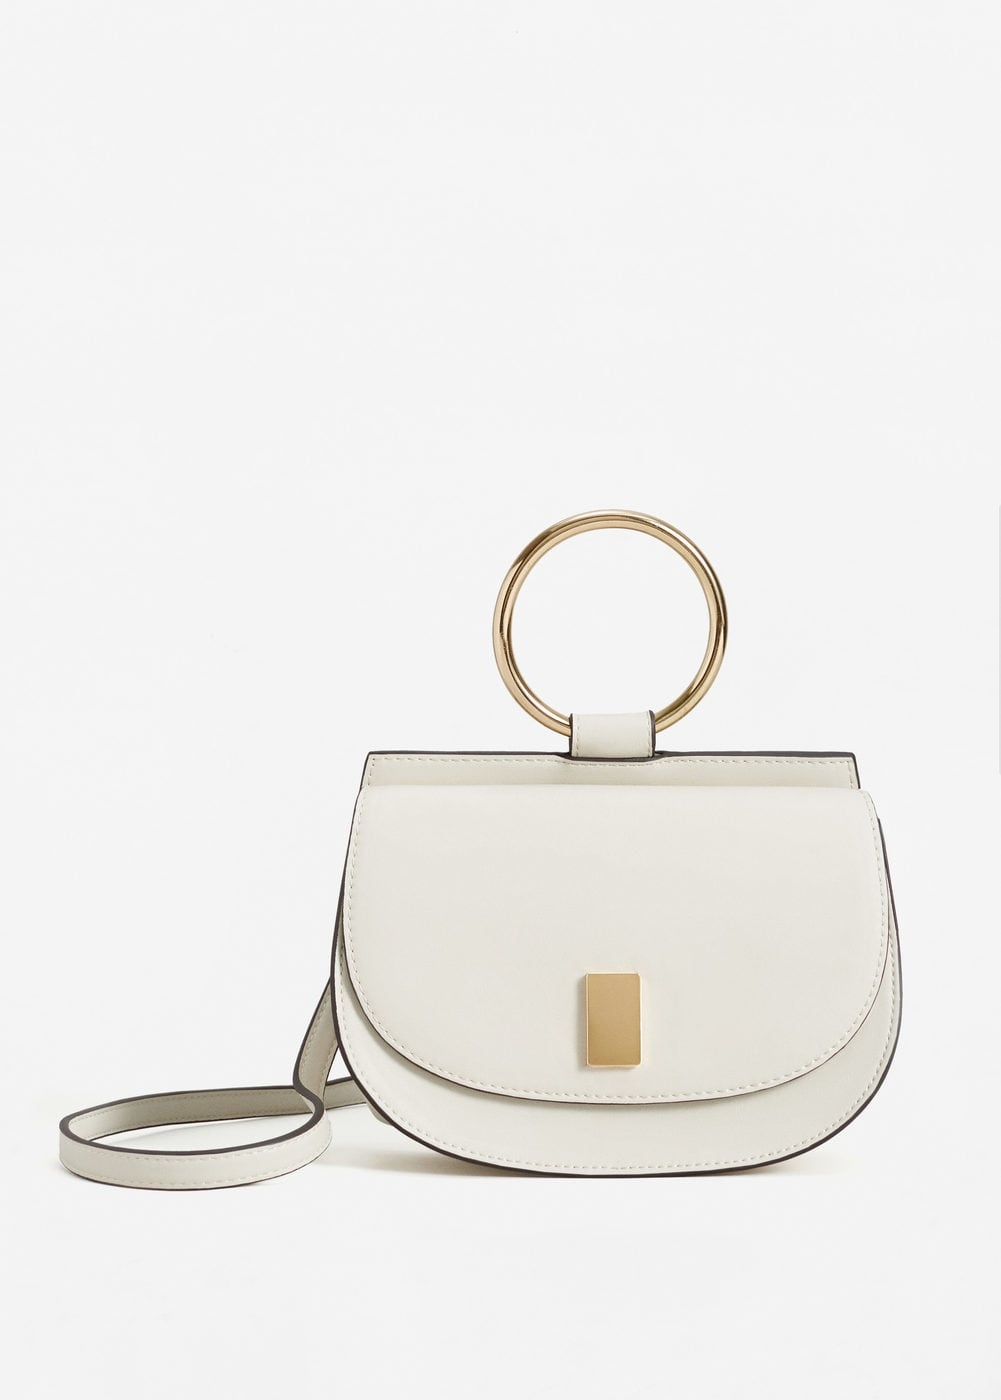 sac à main femme, sac inspi chloé, mango, sac blanc, blog mode